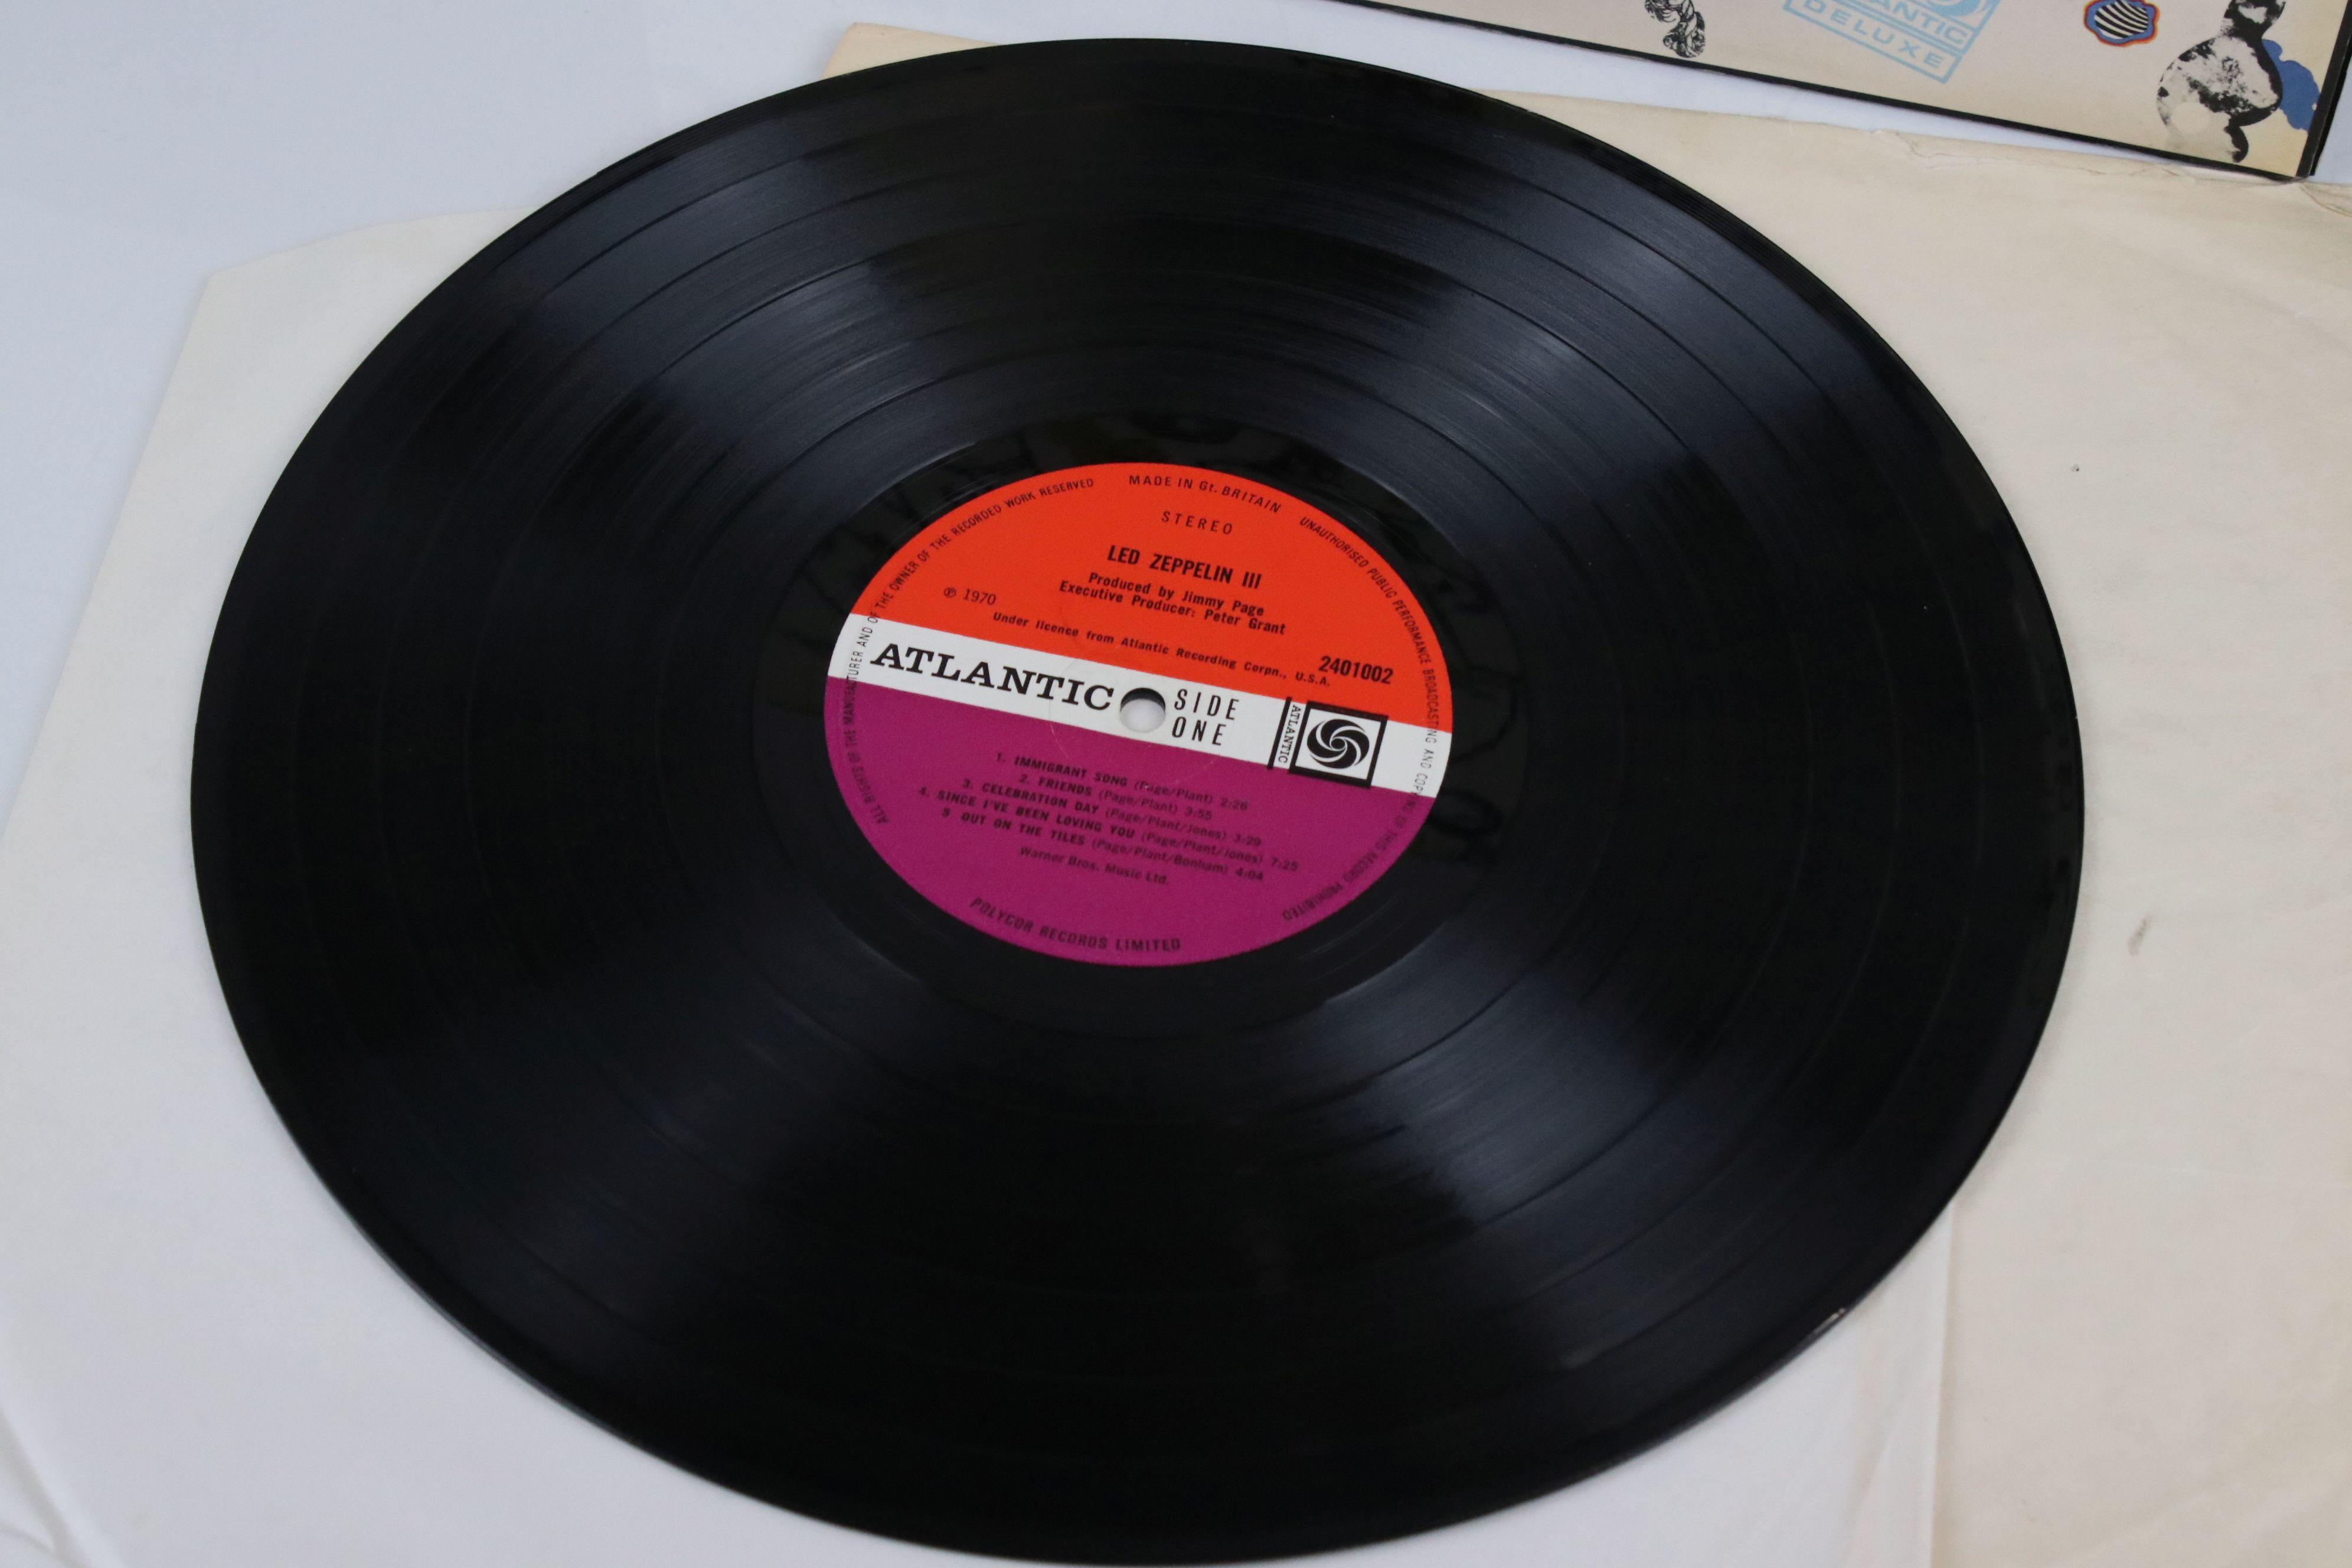 Vinyl - Led Zeppelin III LP on Atlantic Deluxe 2401002 red/maroon label, 1st pressing, sleeve vg - Image 2 of 7